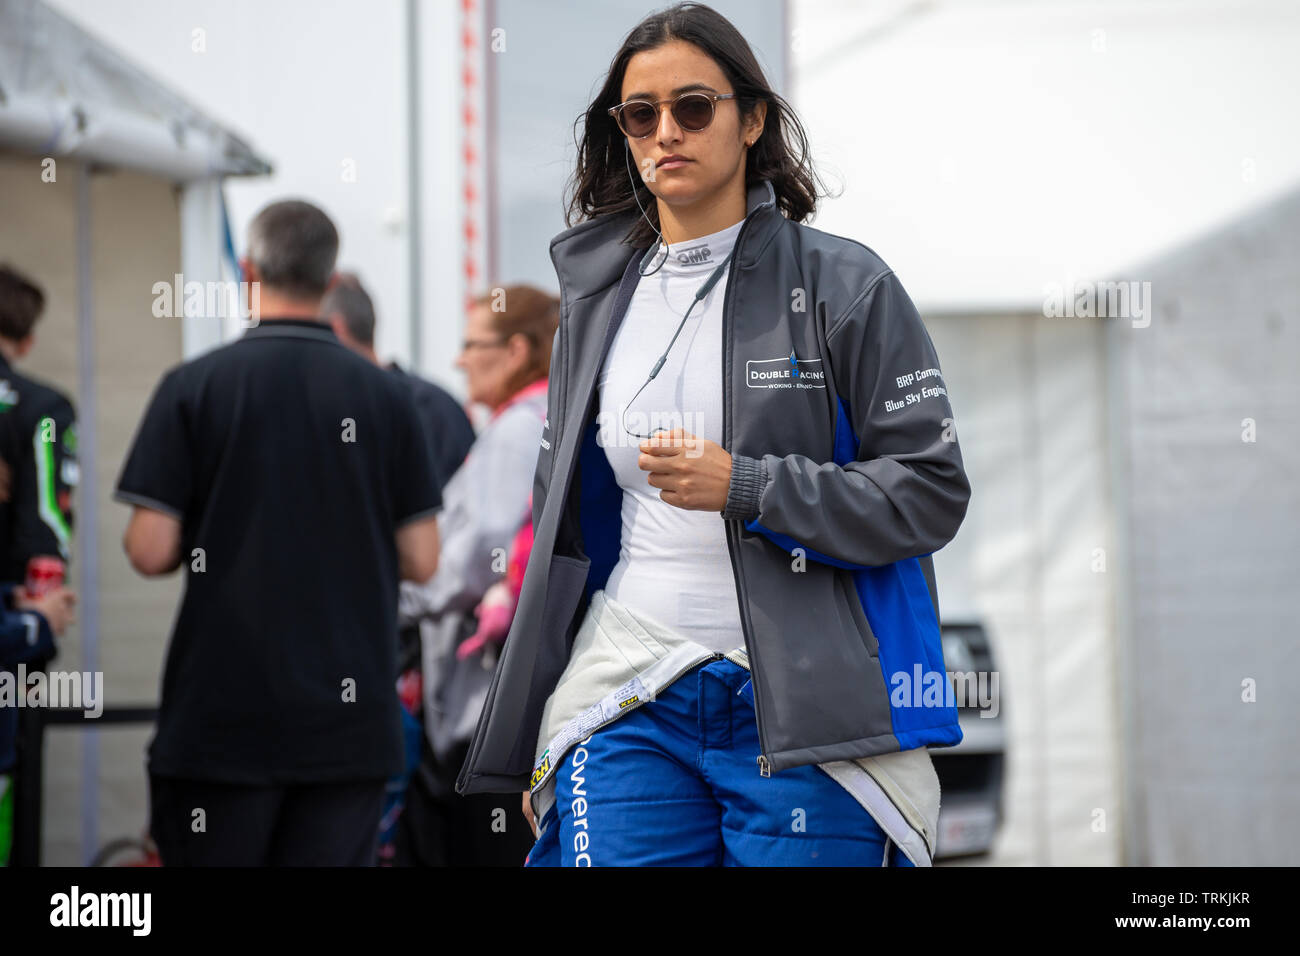 Reema Al Juffali, saudi Arabian female F4 Formula 4 racing Driver in the paddocks at Thruxton Race Circuit, Hampshire, England - Stock Image